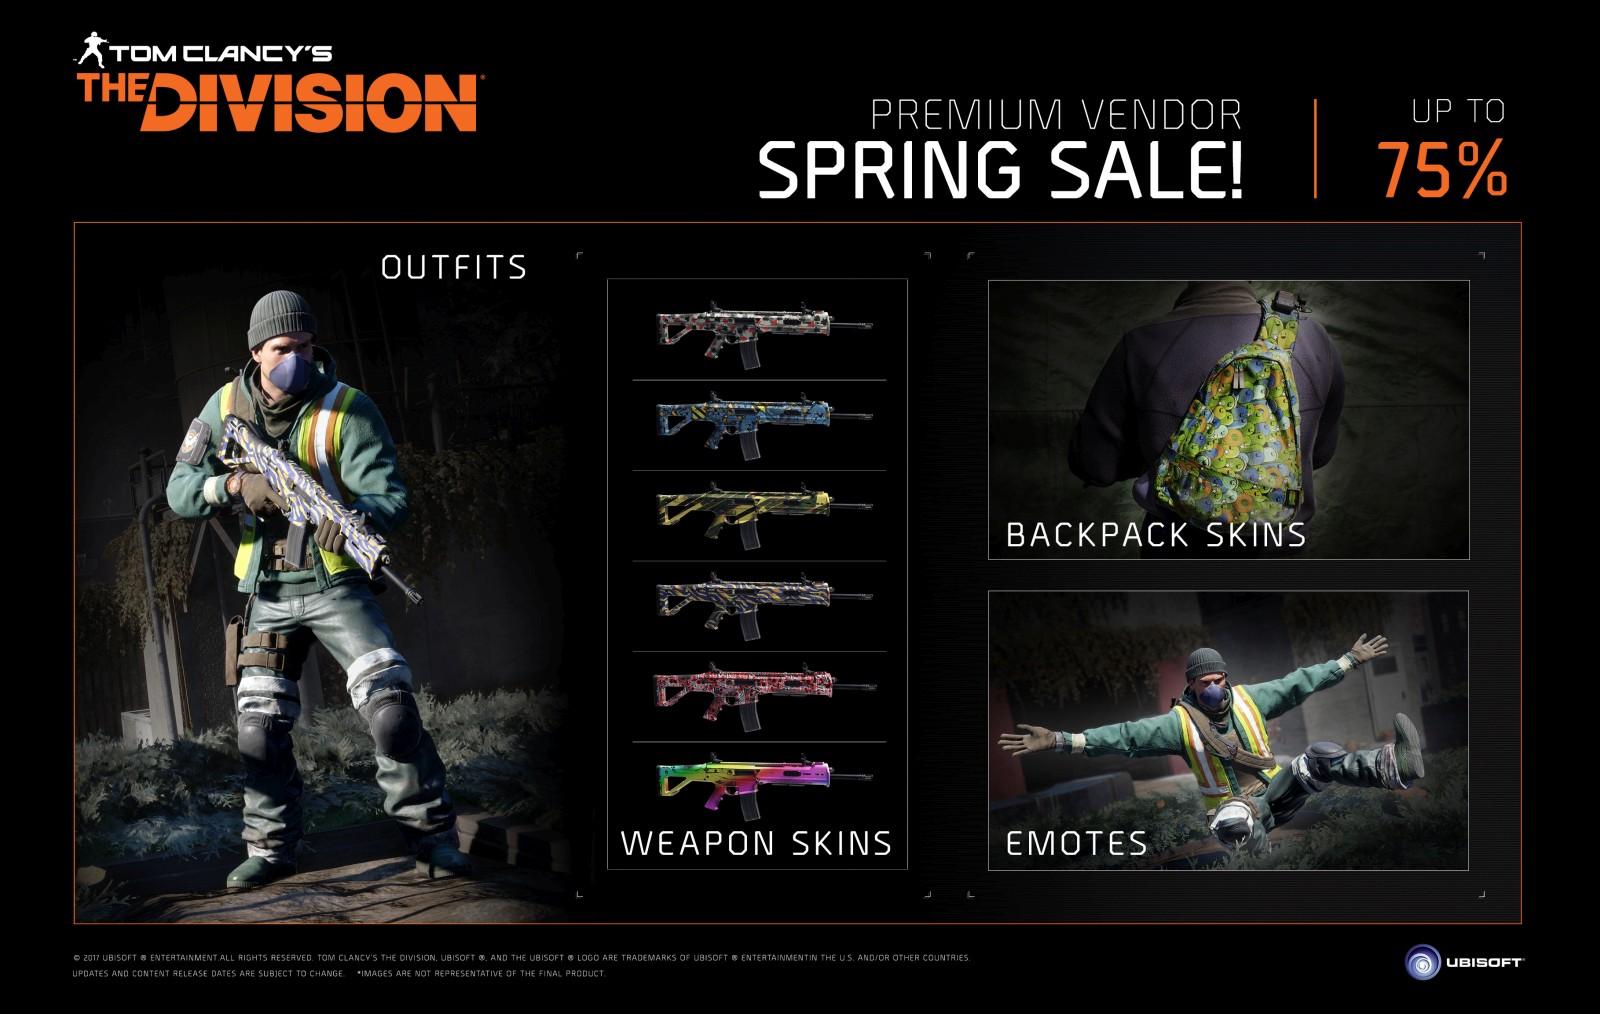 springsales_final_2883